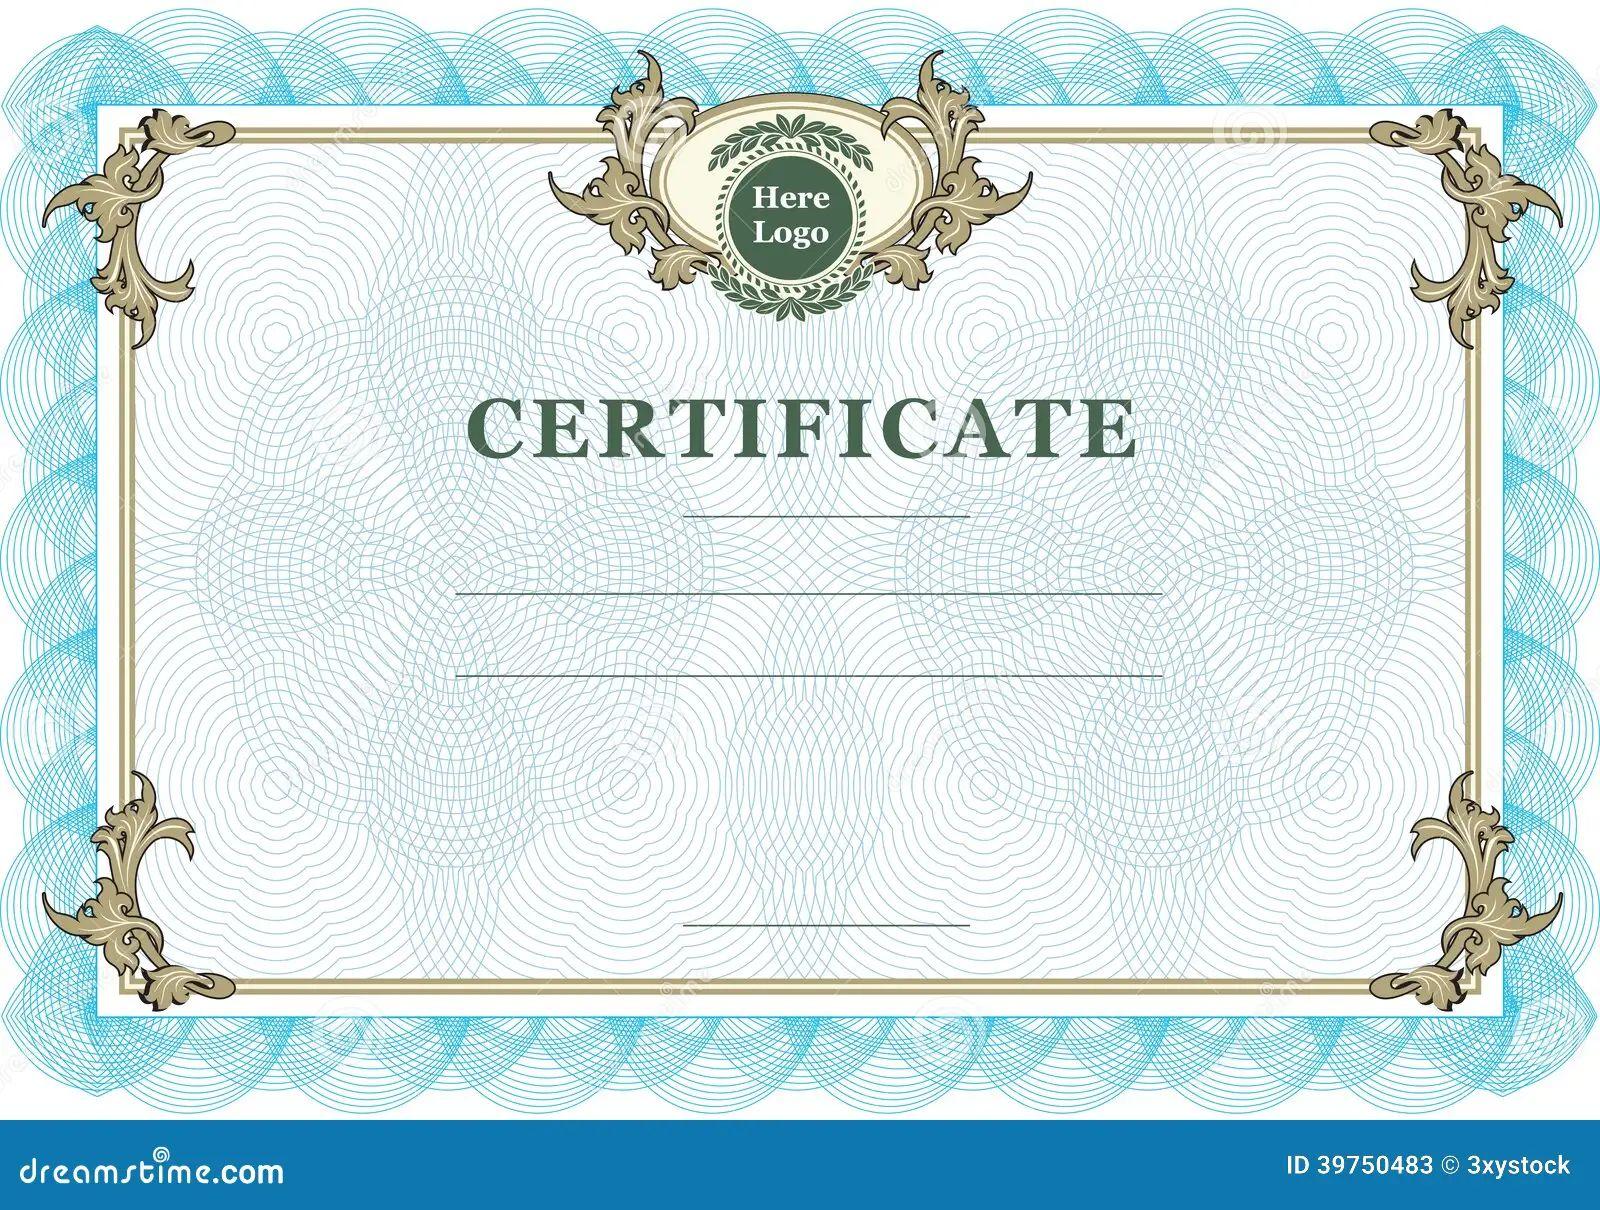 design gift certificate